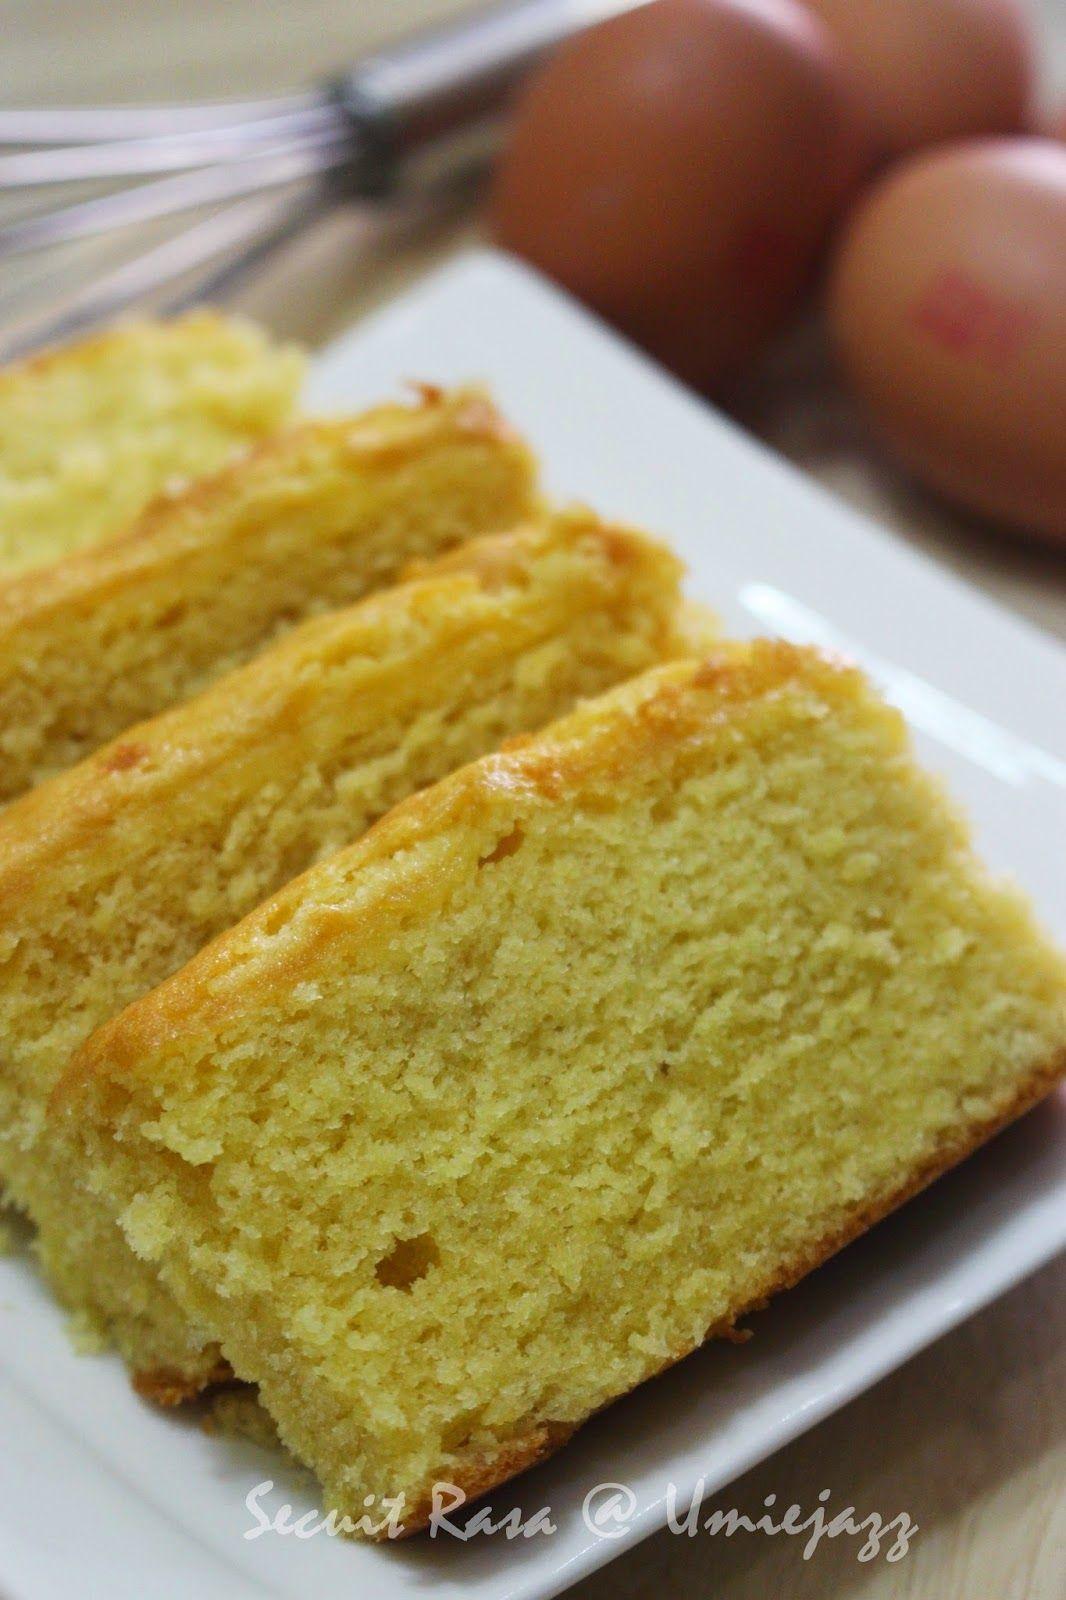 Secuit Rasa: BUTTER CAKE SEDAP.... BETUL KATA K.JEE